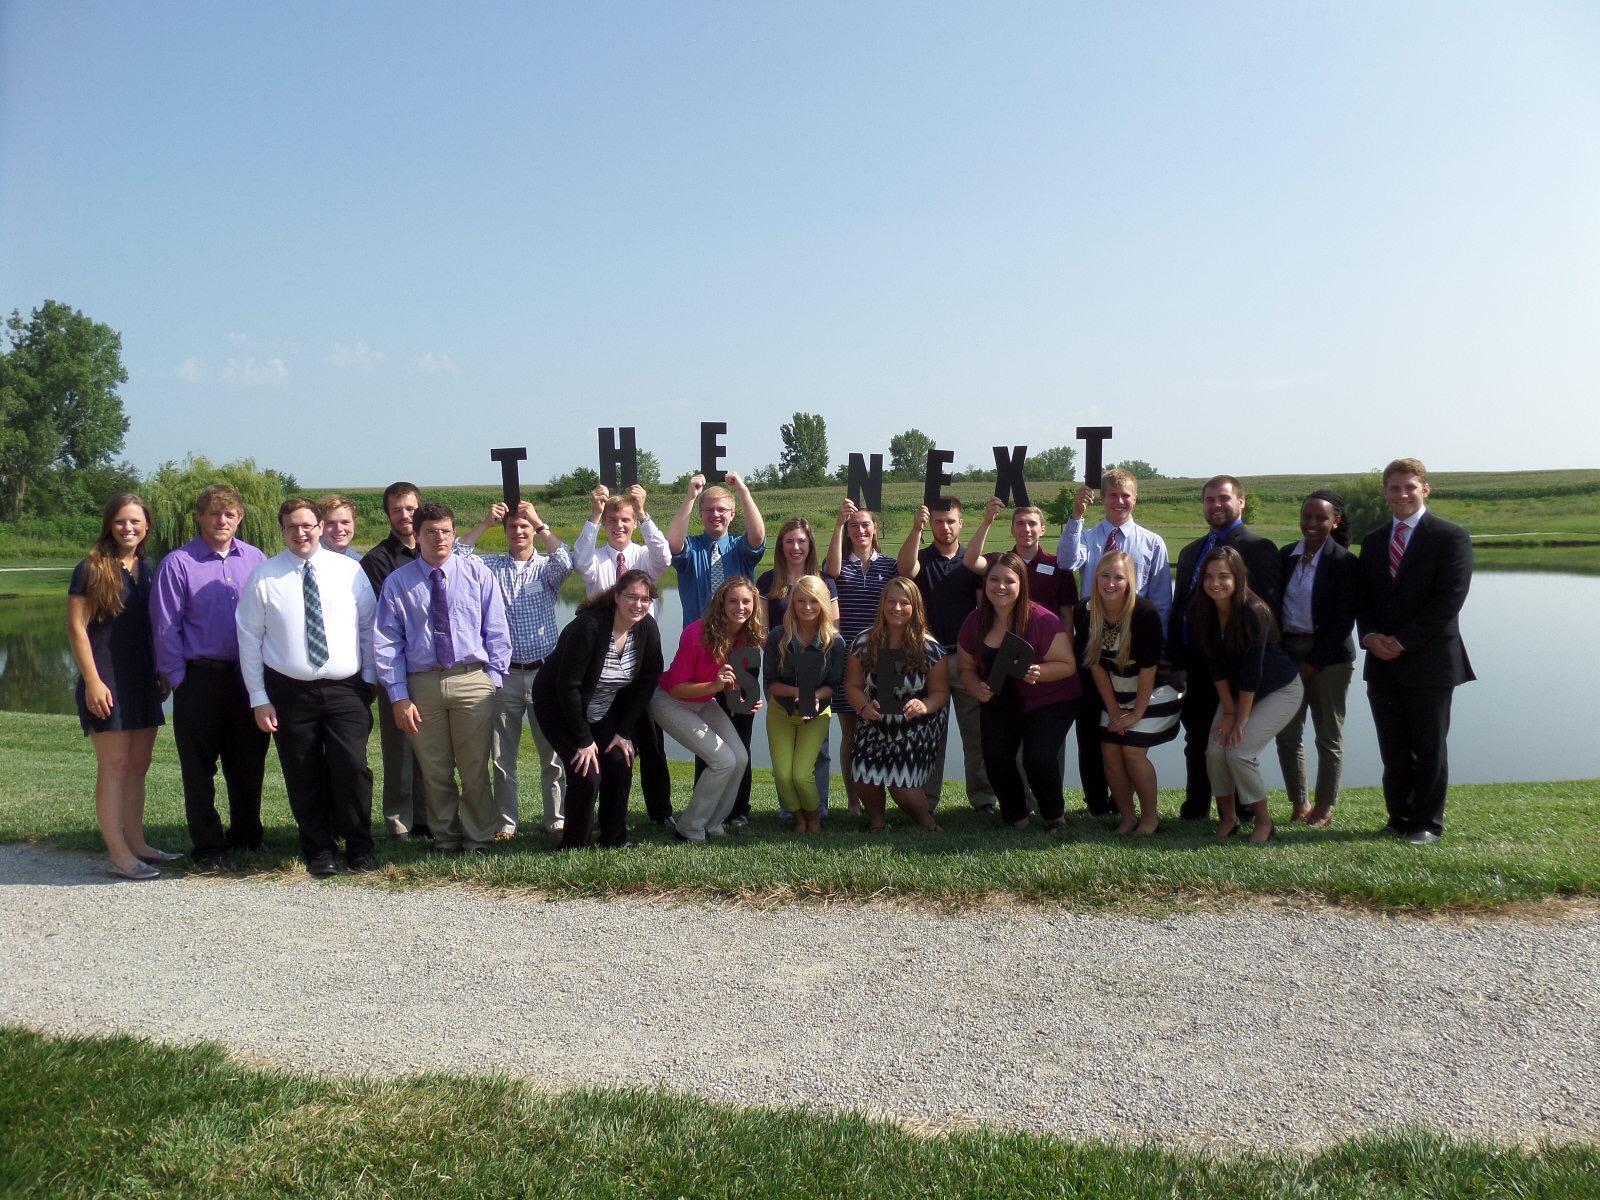 Cambridge interns group photo